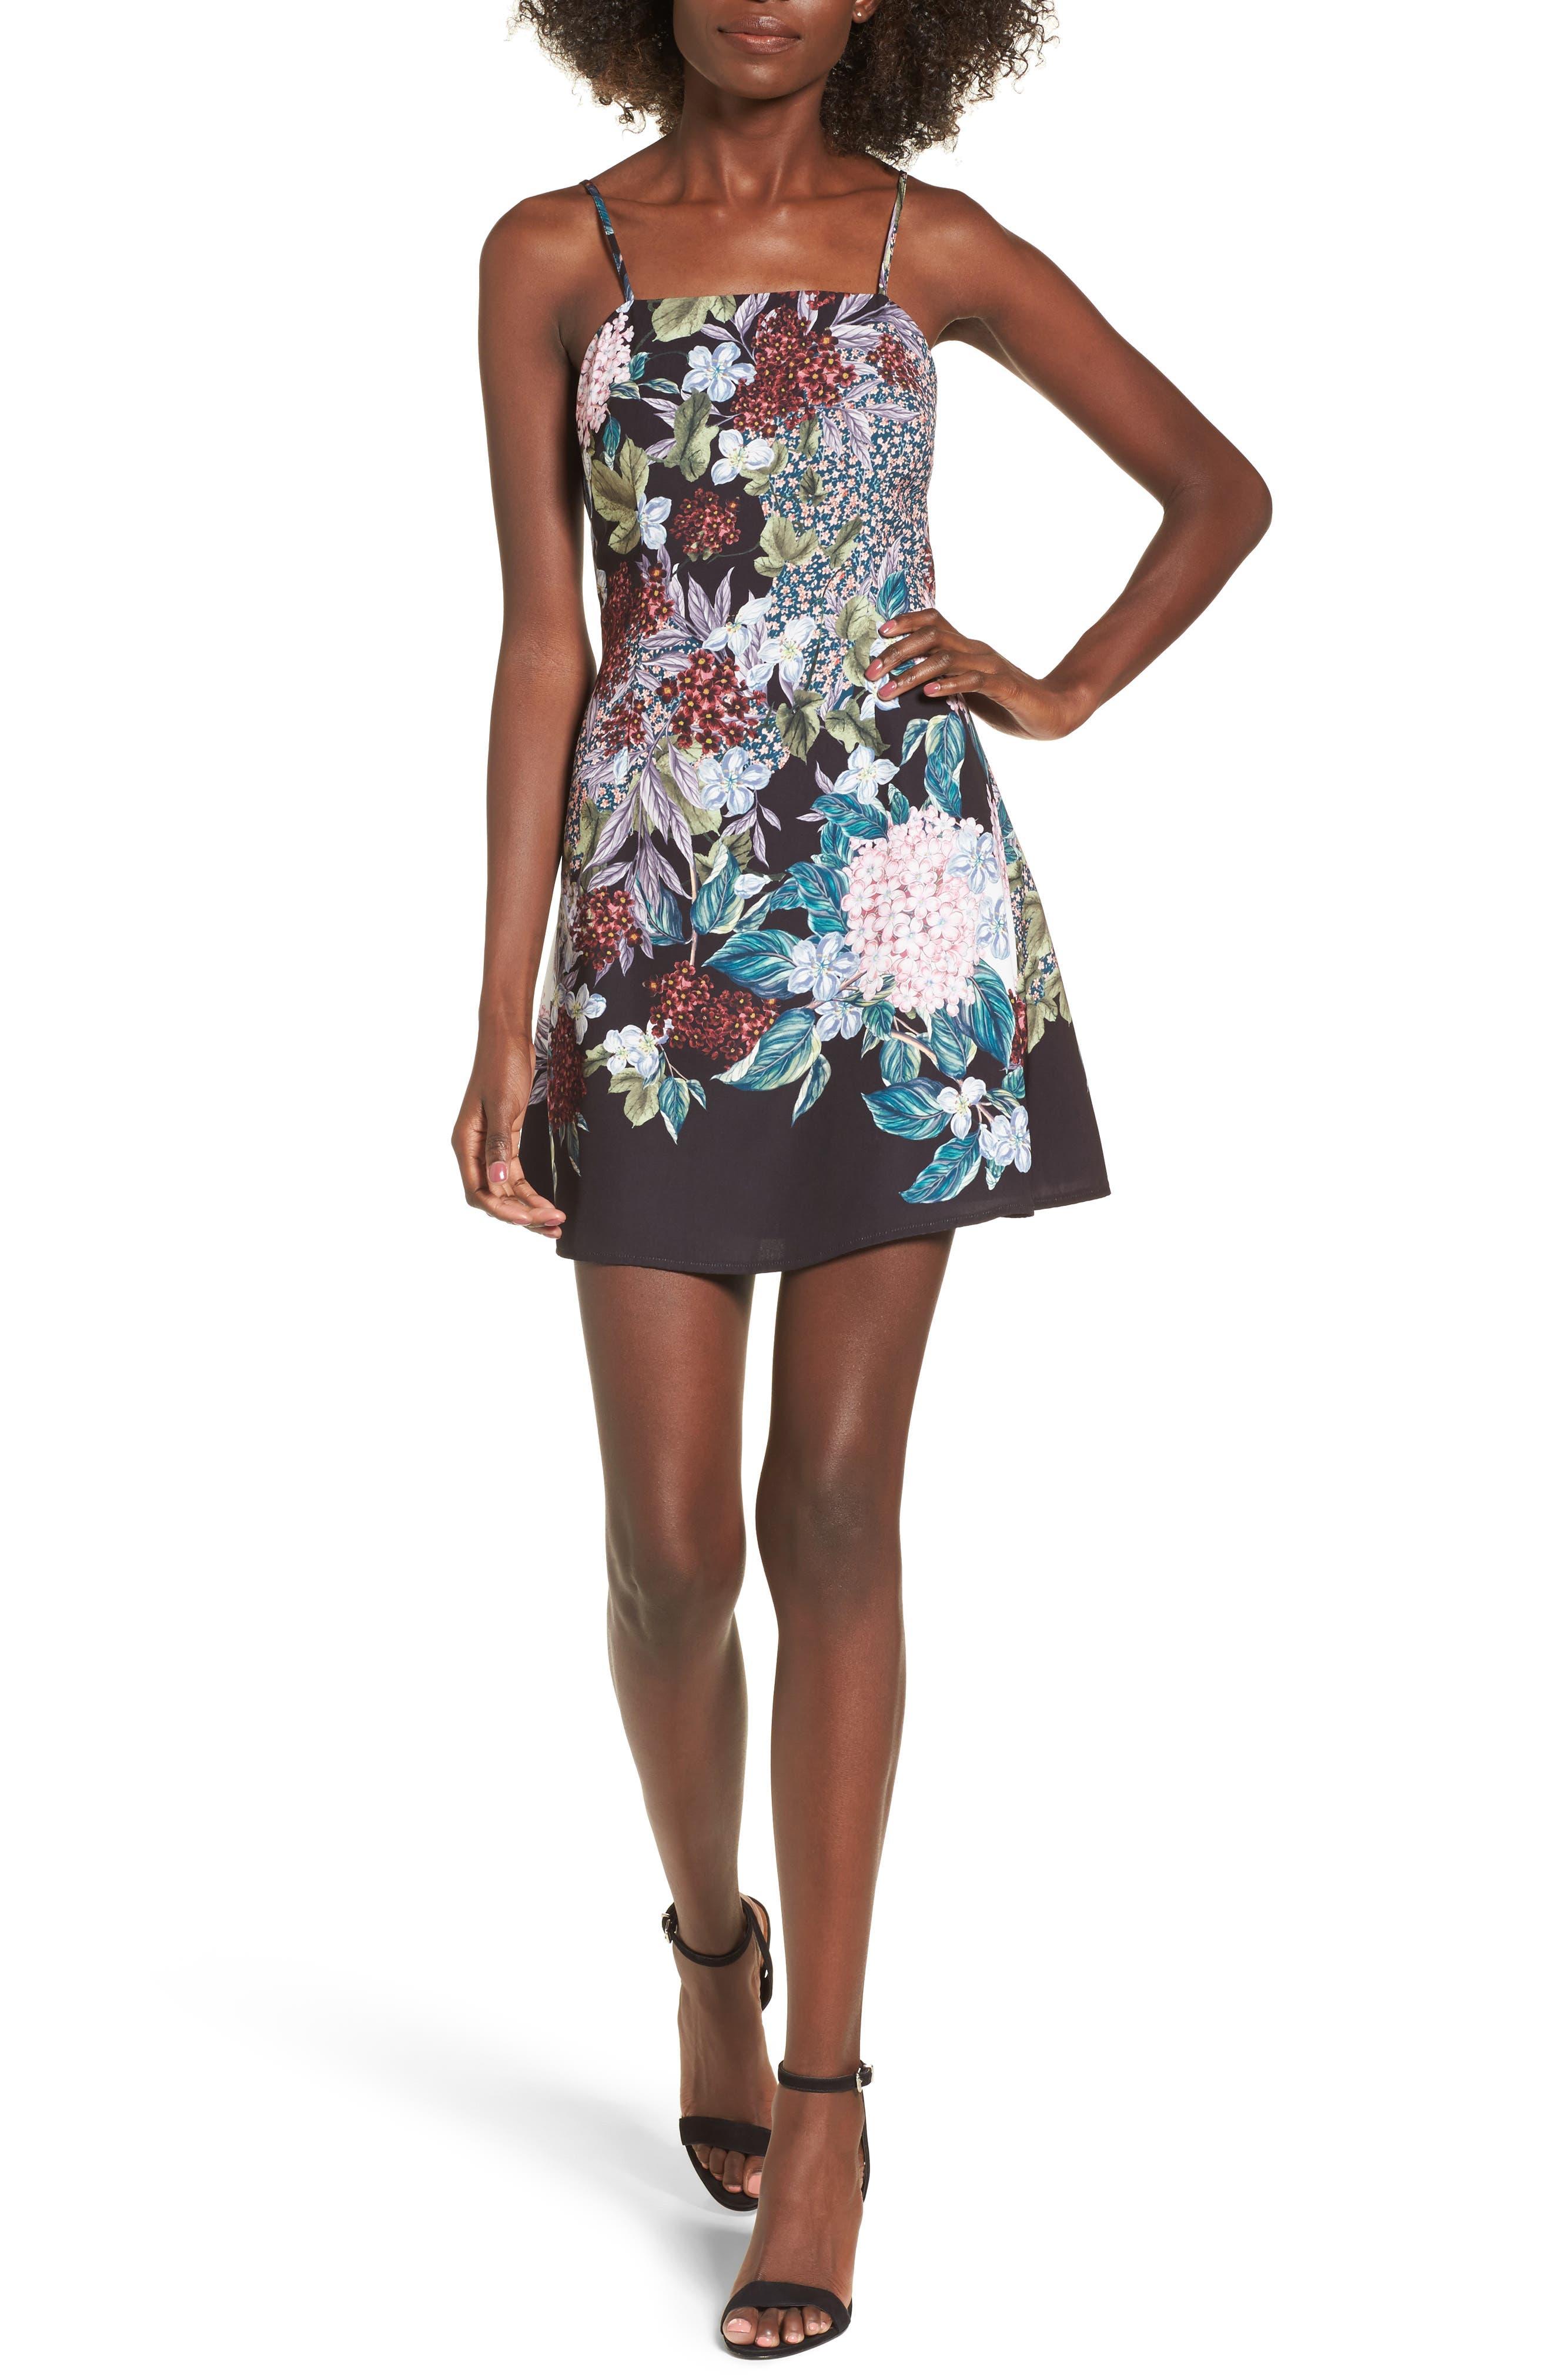 Lost Dreams A-Line Minidress,                         Main,                         color, Multi Floral